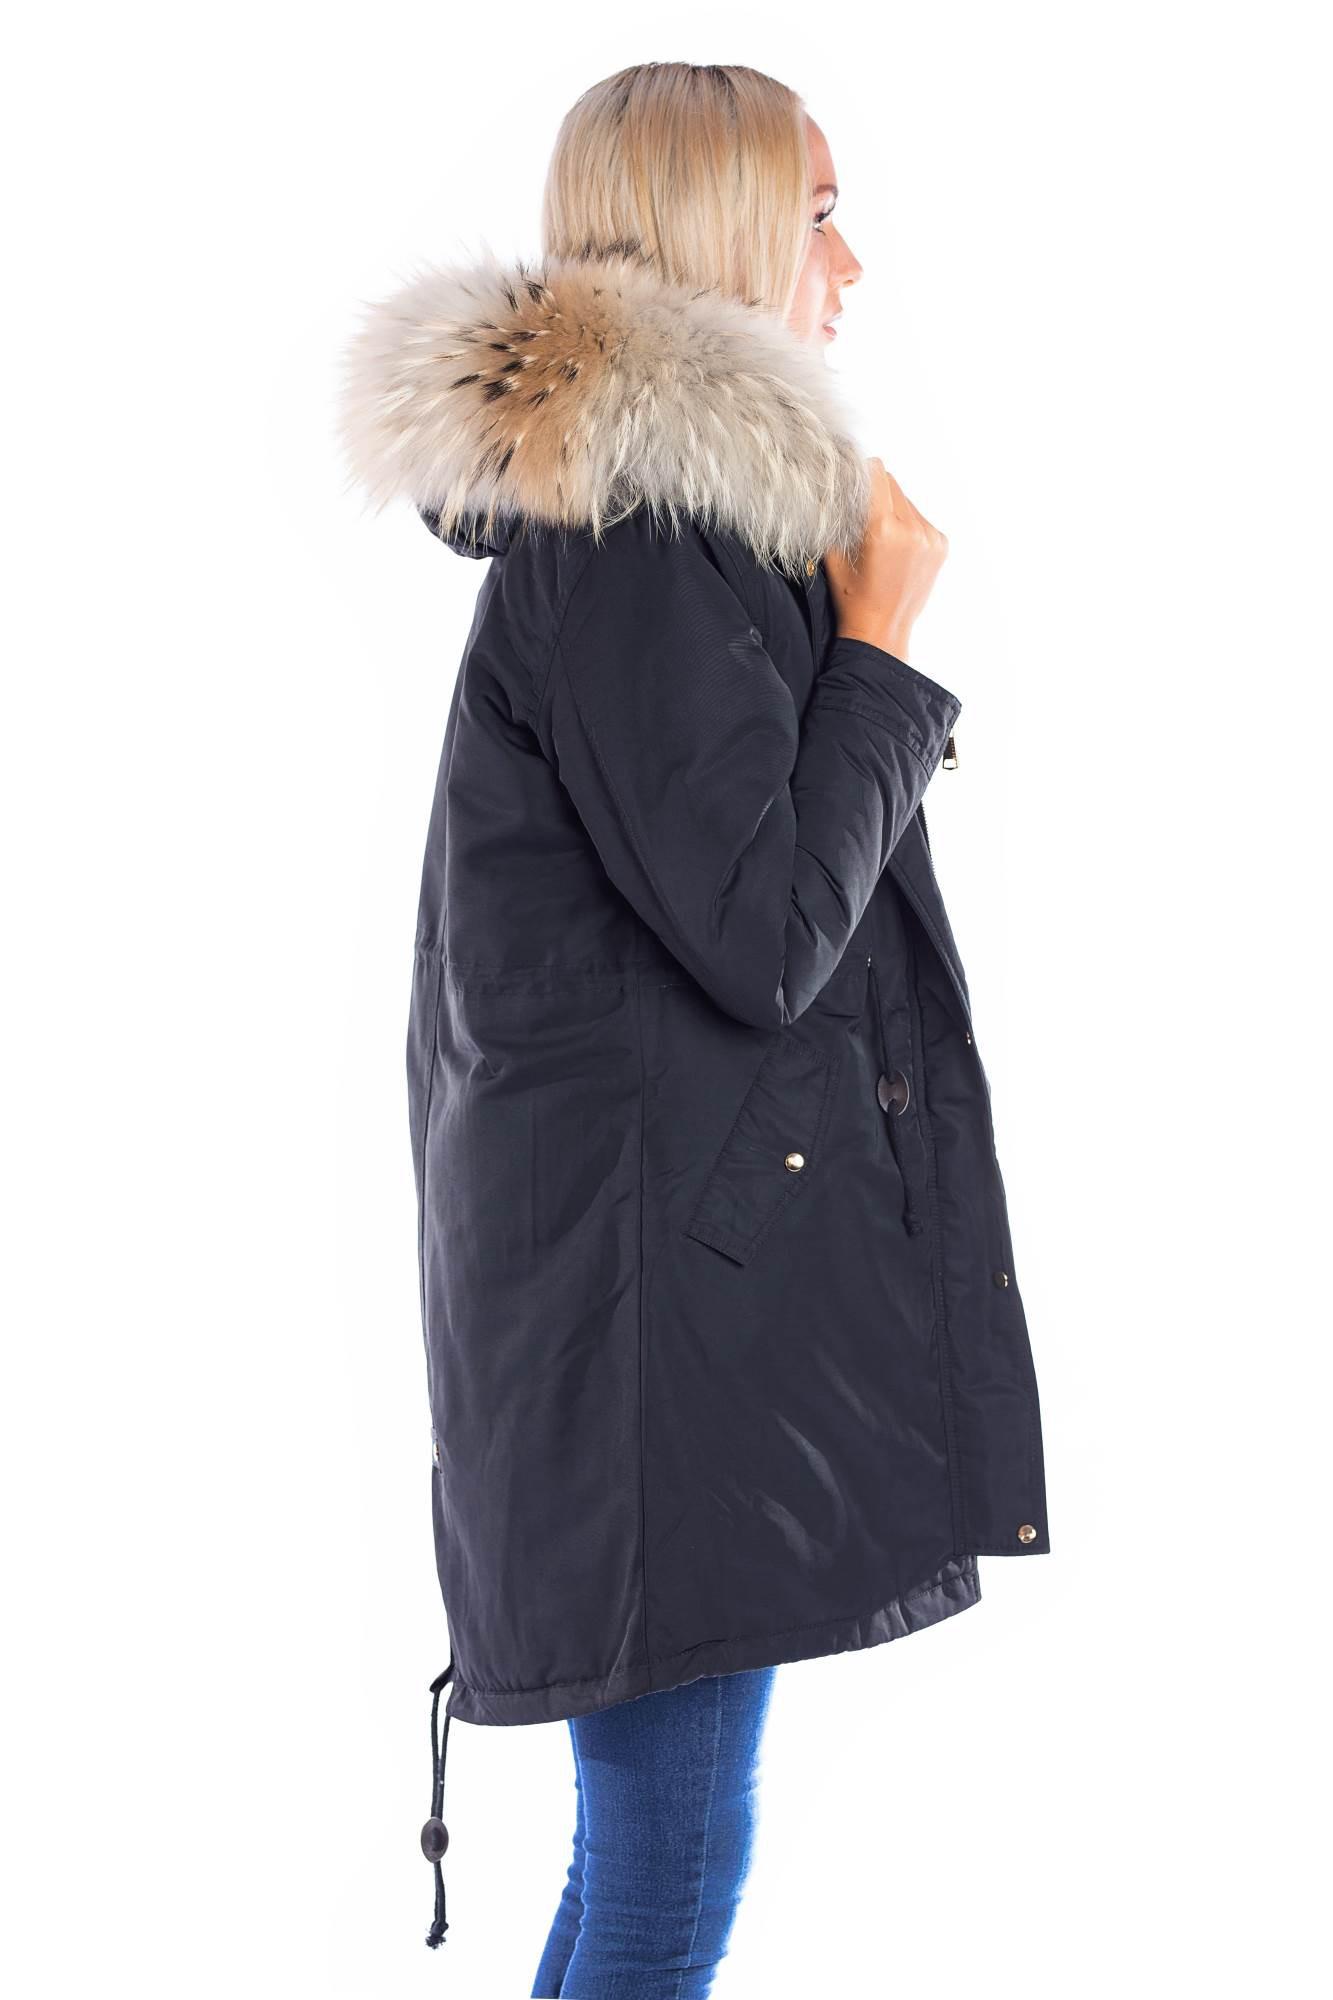 timeless design 9308c d8ef7 Parka mit Fellkapuze XXL Natur braun Fashion Blogger Style